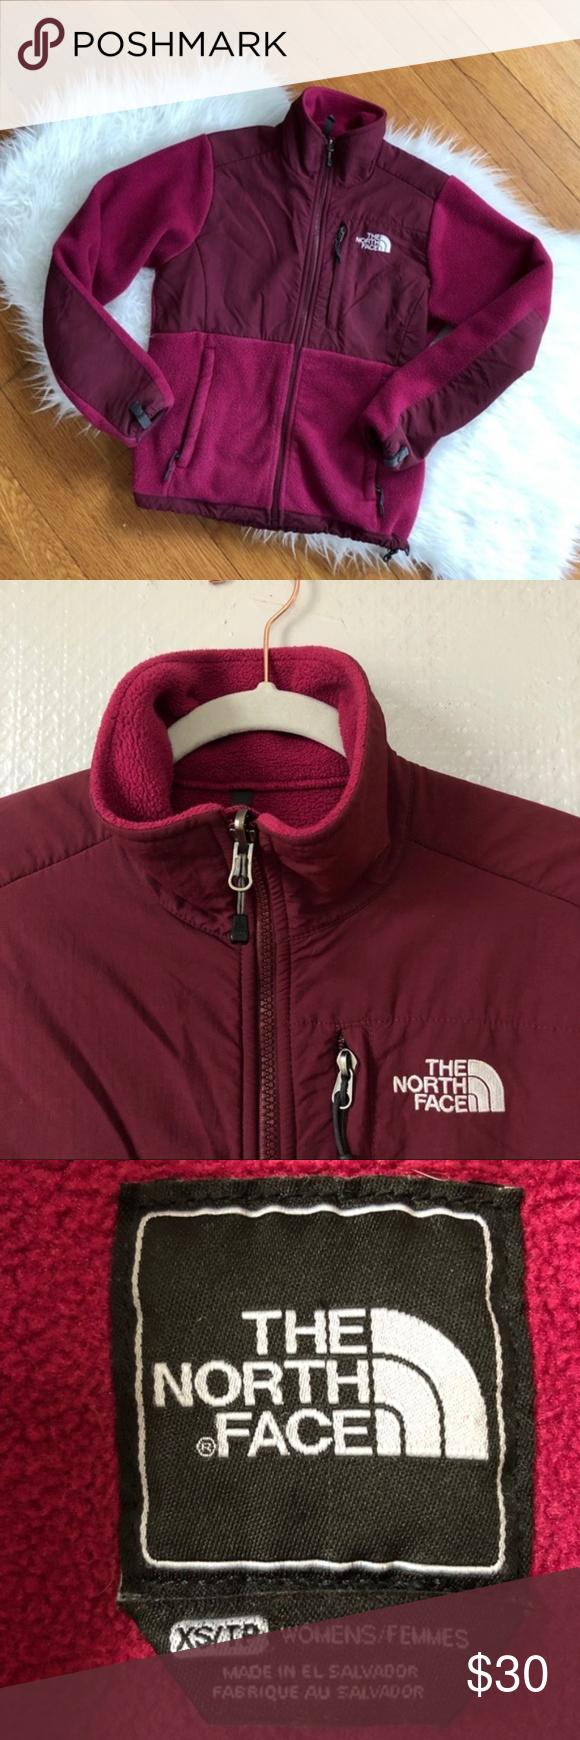 North Face Raspberry Denali Jacket Xs Jackets The North Face North Face Jacket [ 1740 x 580 Pixel ]